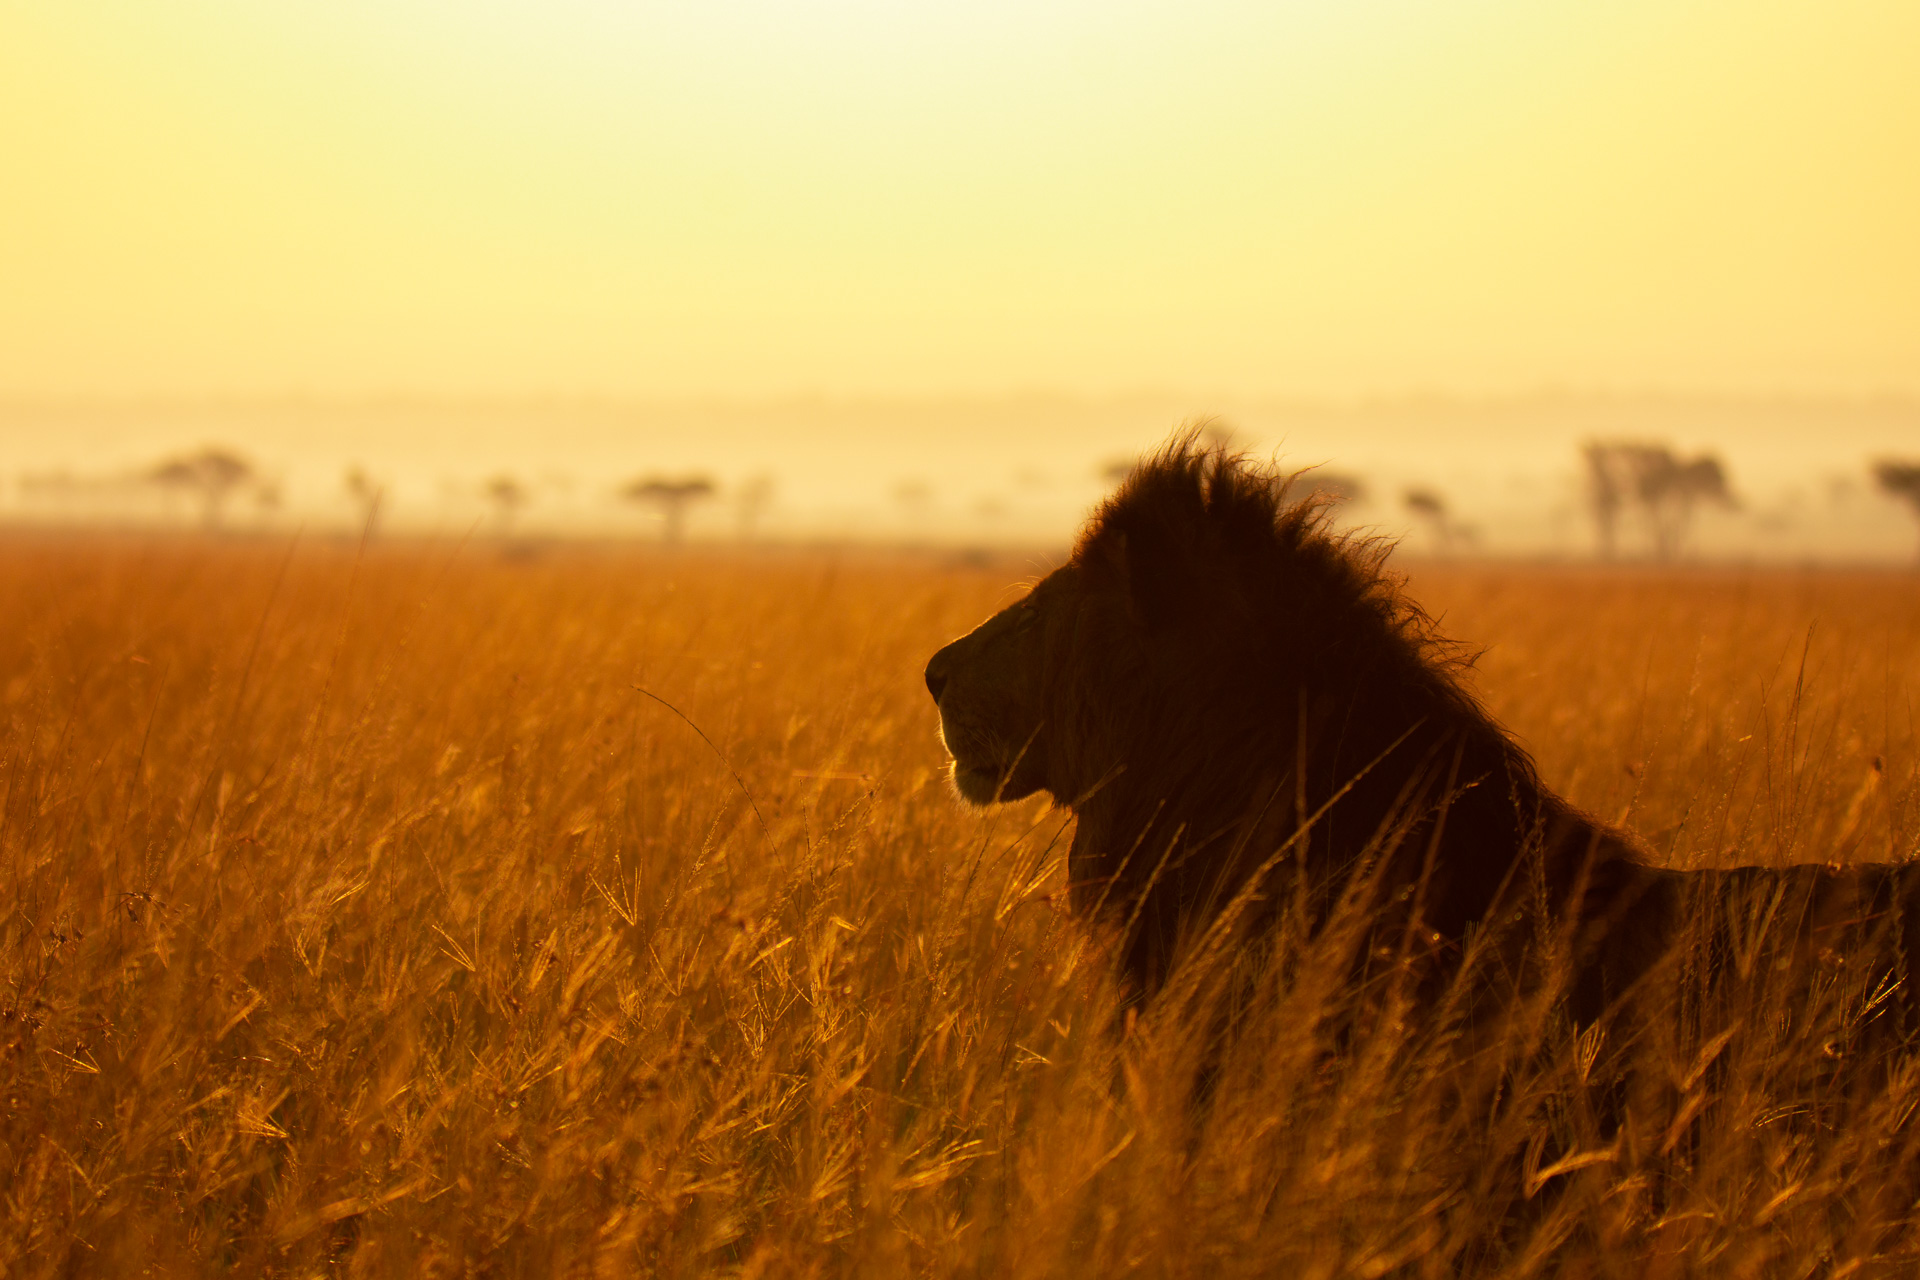 Lion Silouette